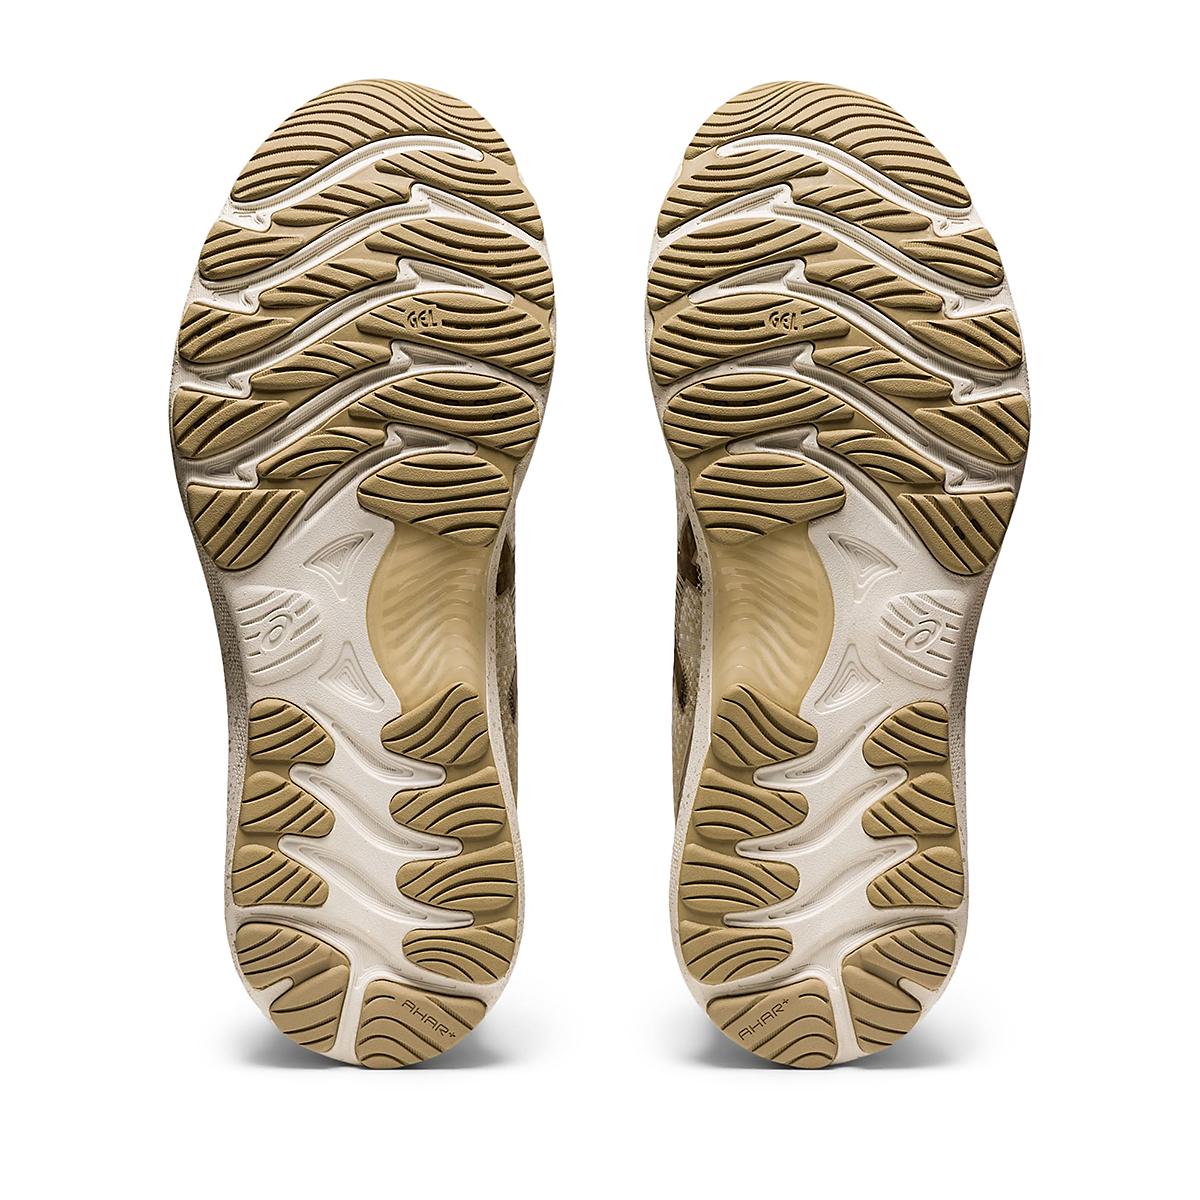 Men's Asics Gel-Nimbus 23 Earth Day Running Shoe - Color: Cream/Putty - Size: 7 - Width: Regular, Cream/Putty, large, image 4